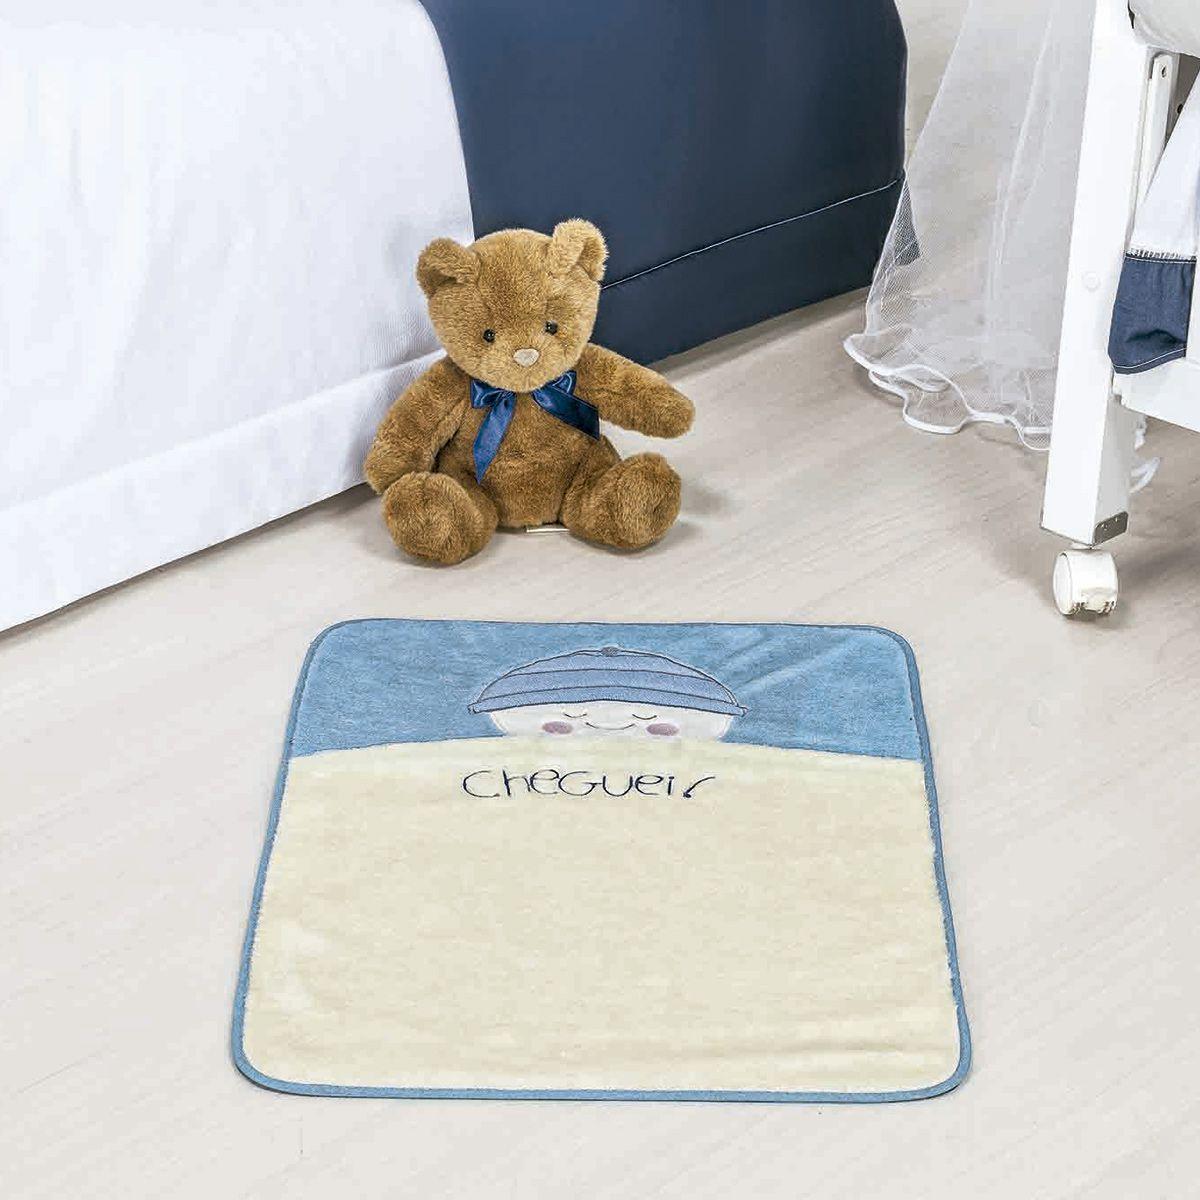 Tapete Infantil Premium Baby Formato Bebê Cheguei Azul Turquesa 68cm x 48cm